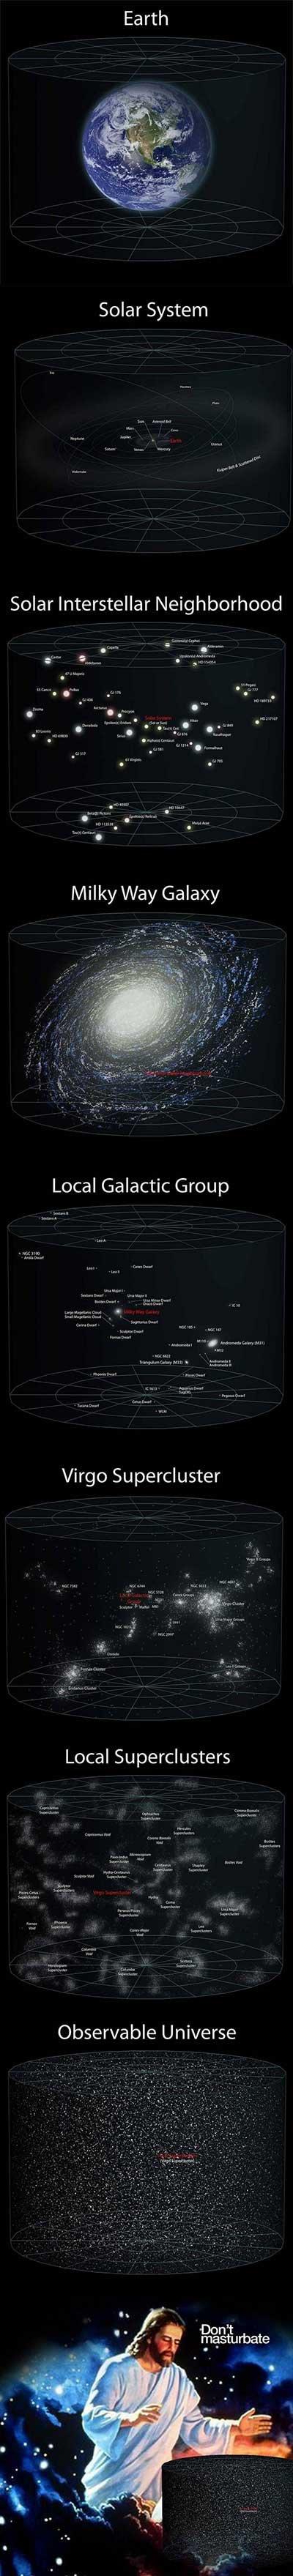 Woah. . Earth Solar Interstellar Neighborhood Eviler:- 55 E Local Galactic Group Legall earh.. Still cracks me up, every damn time.